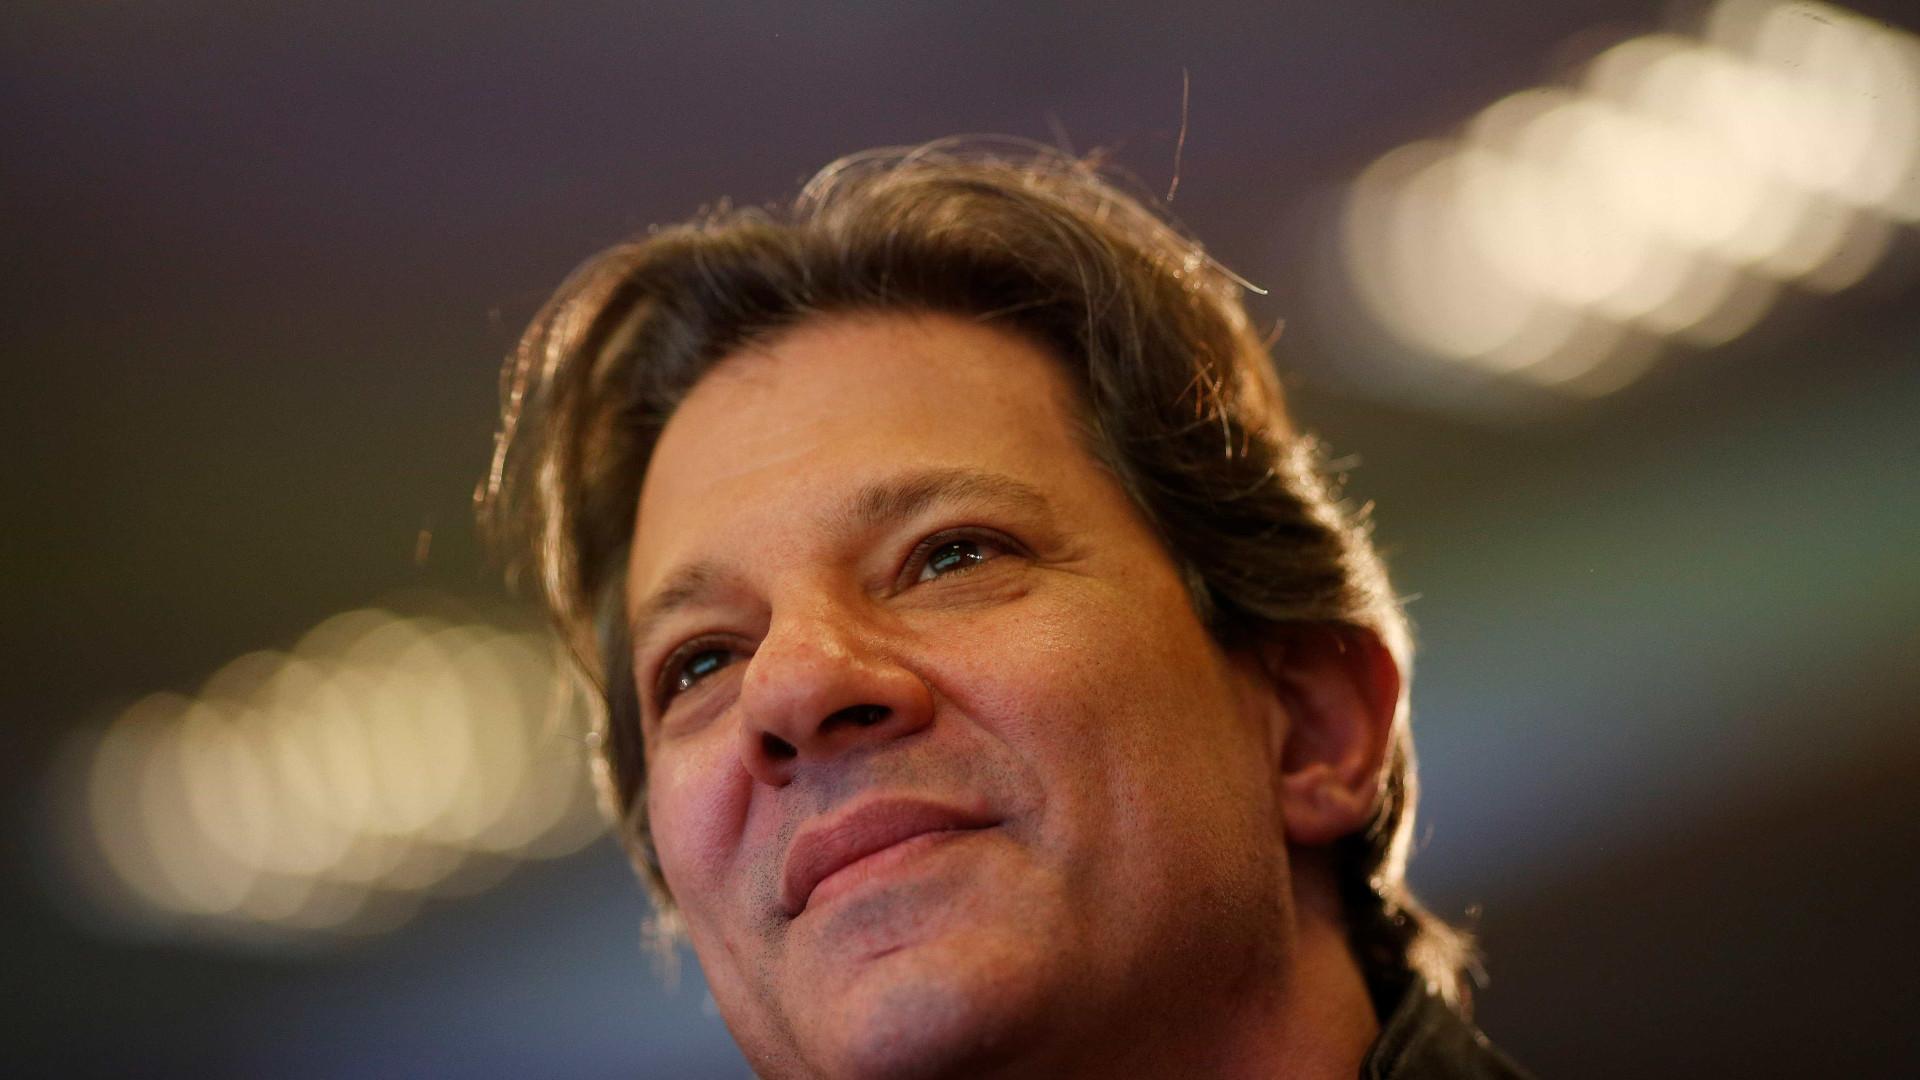 Haddad bate em Bolsonaro e se apresenta como defensor da democracia